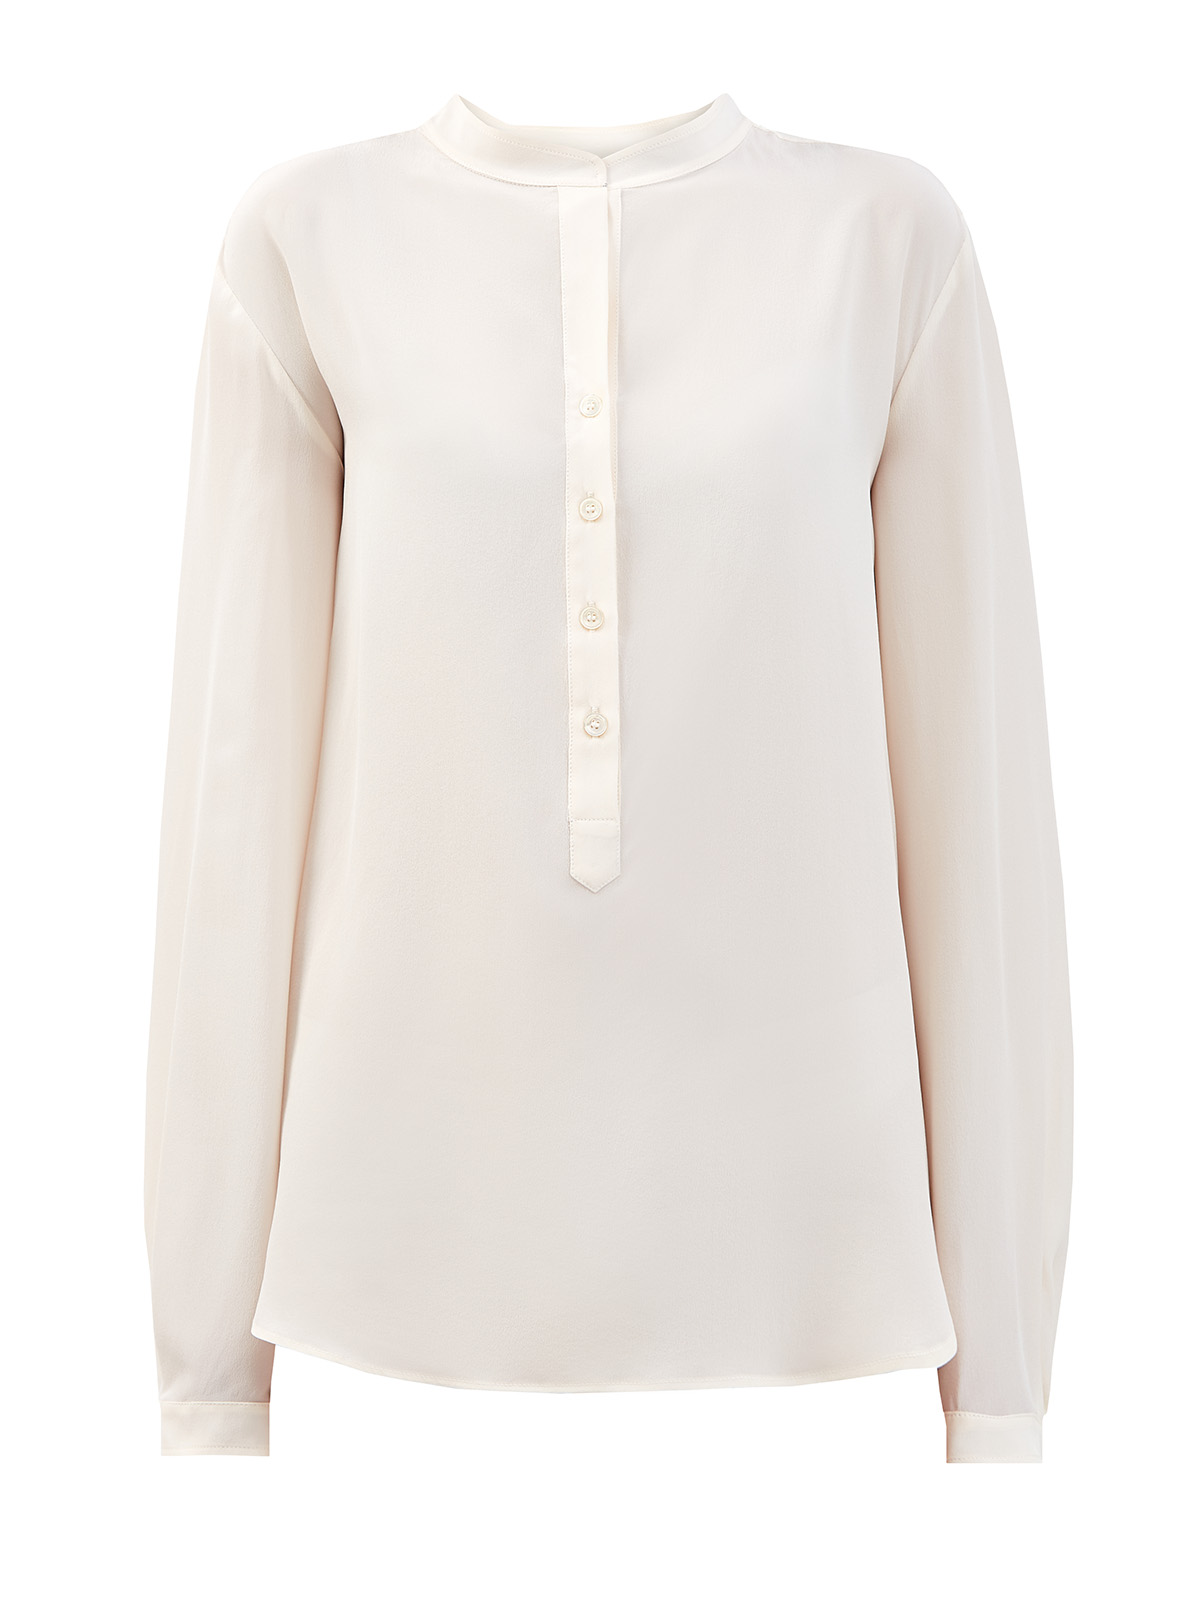 Шелковая блуза Eva с застежкой на пуговицы